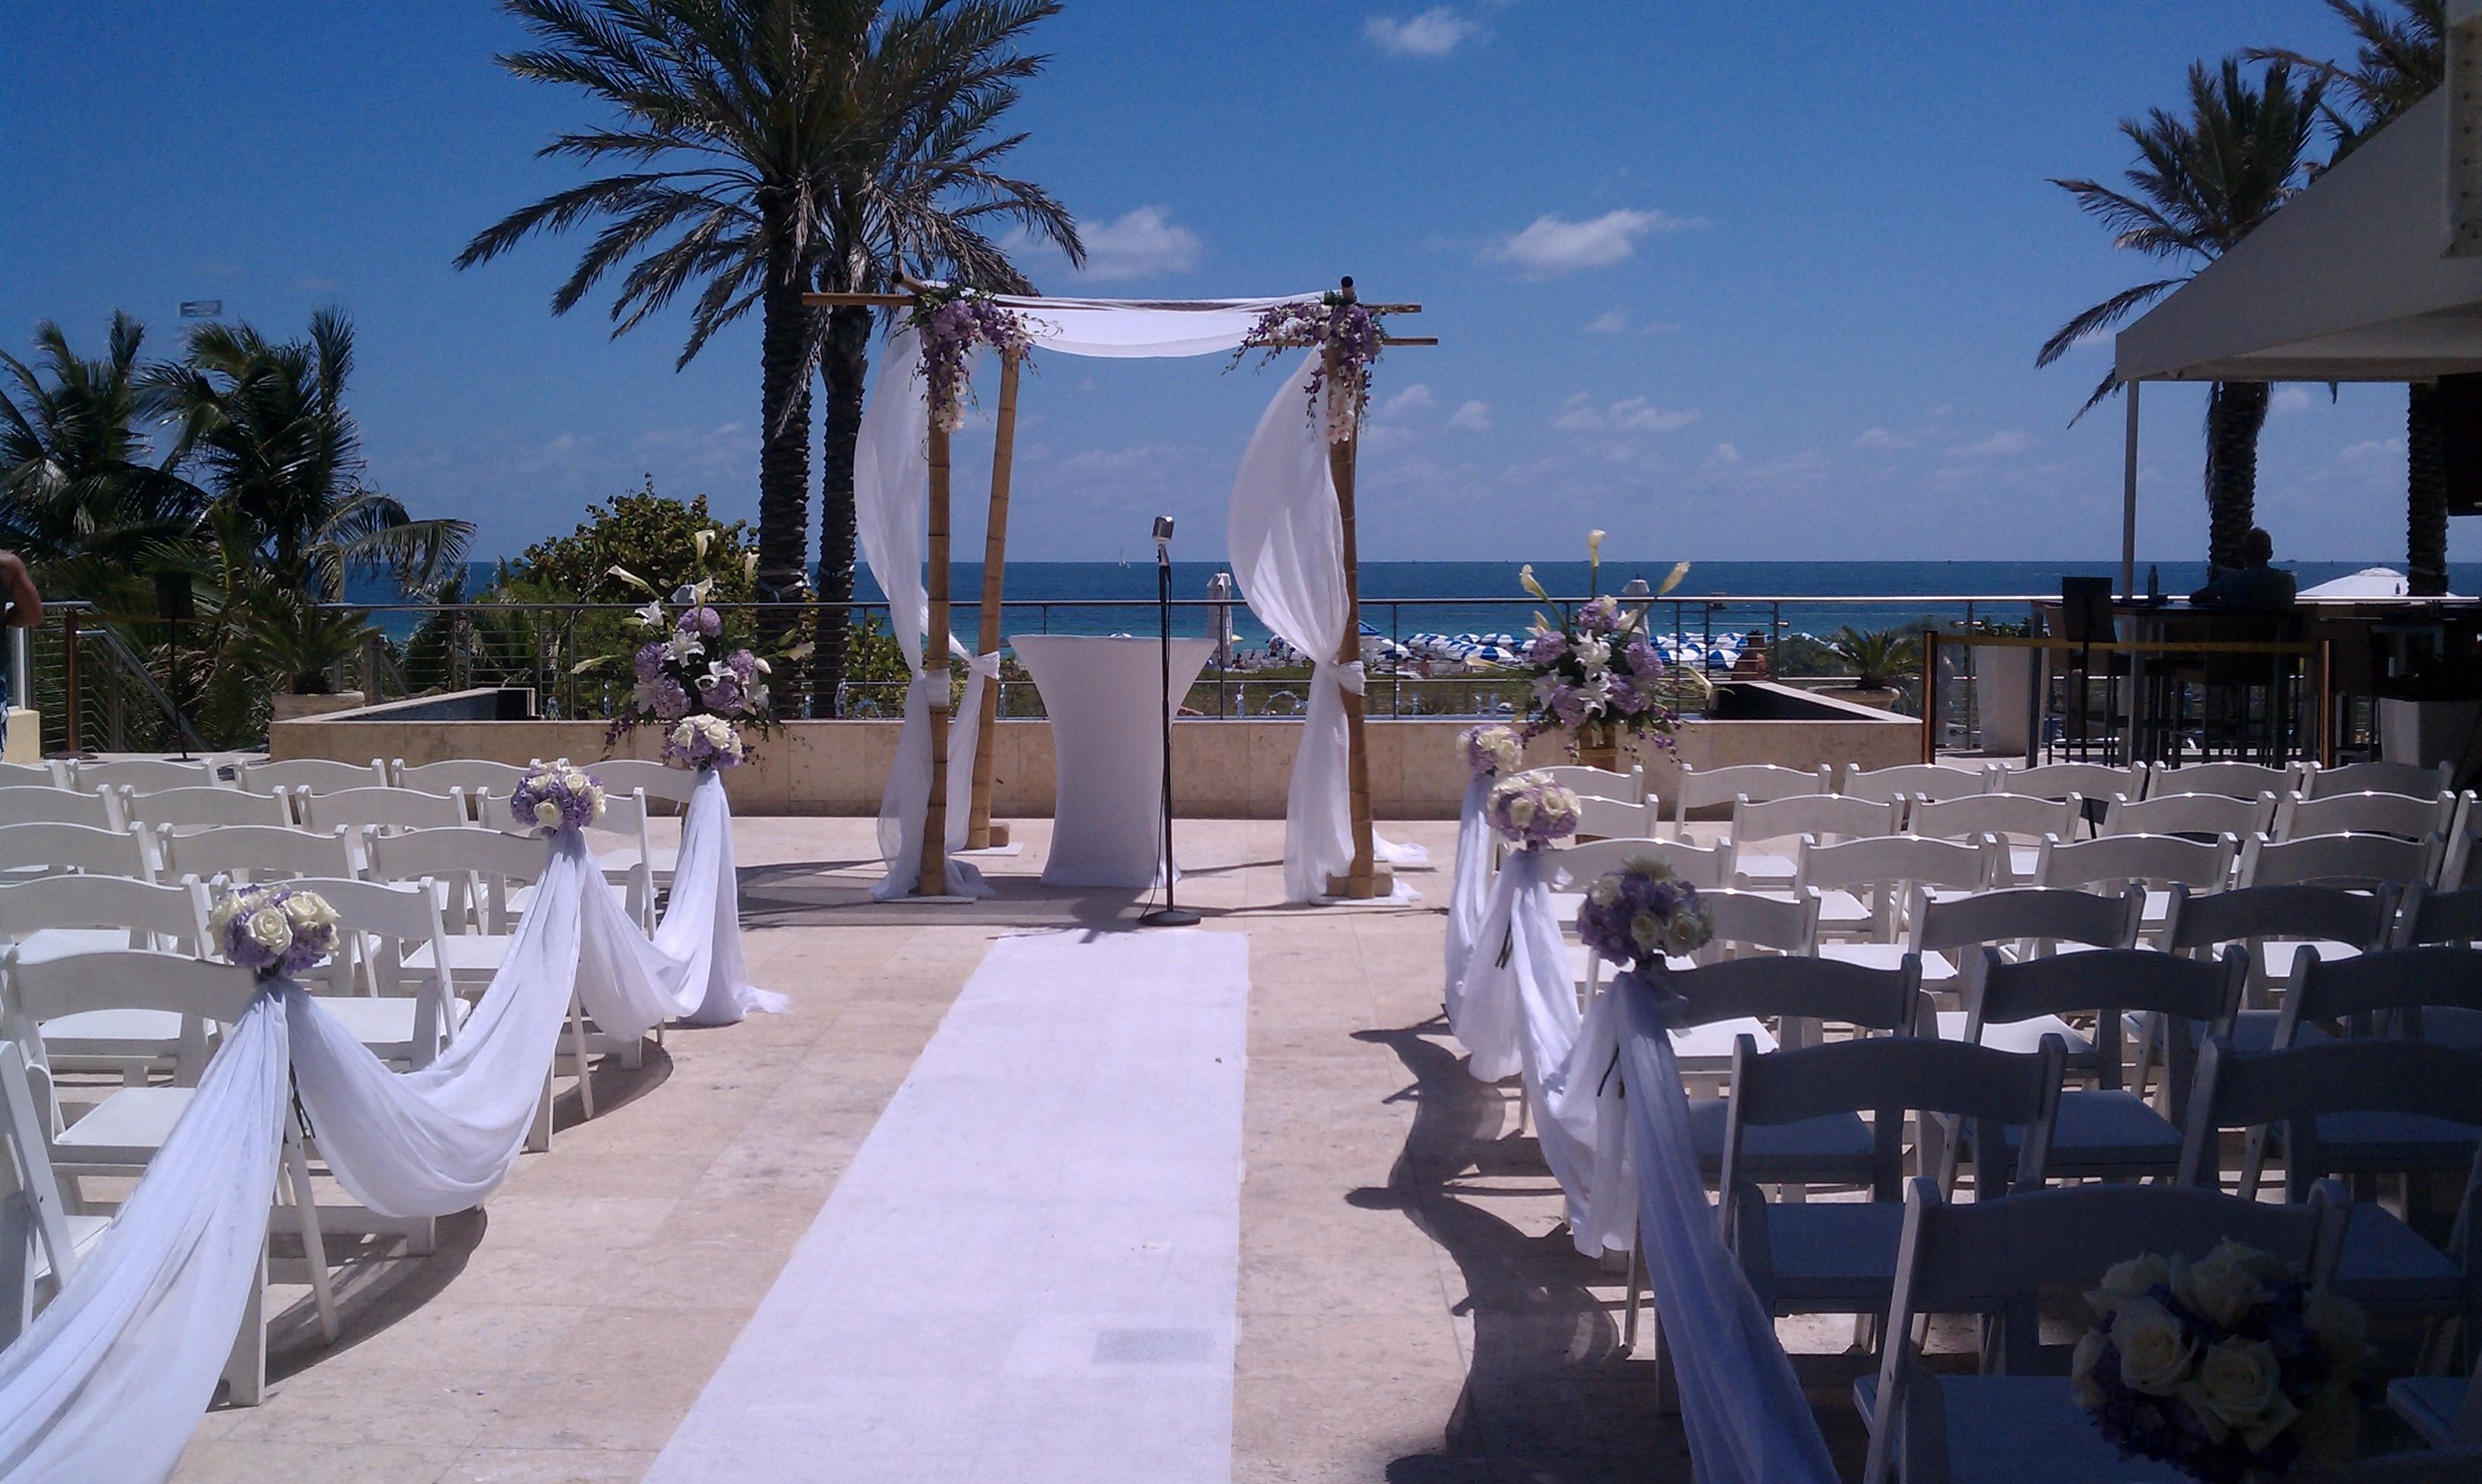 South beach weddings hasel b designs for Beach weddings in ny